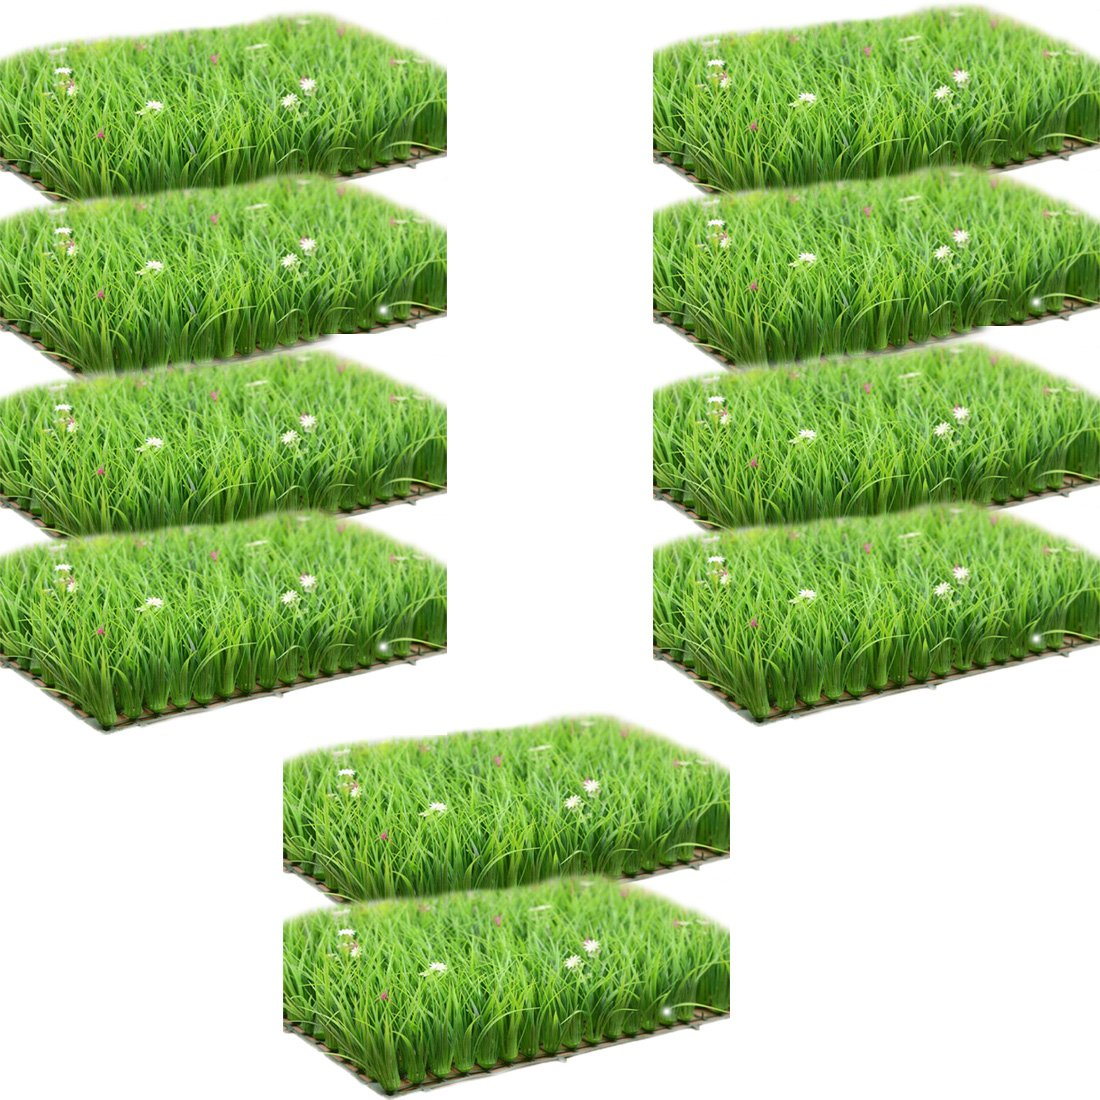 lewu ウォールグリーン マット 壁掛け 造花 人工観葉植物 インテリア アンティーク 雑貨 40x60cm/枚 (10枚入れ) B075R35F3Q